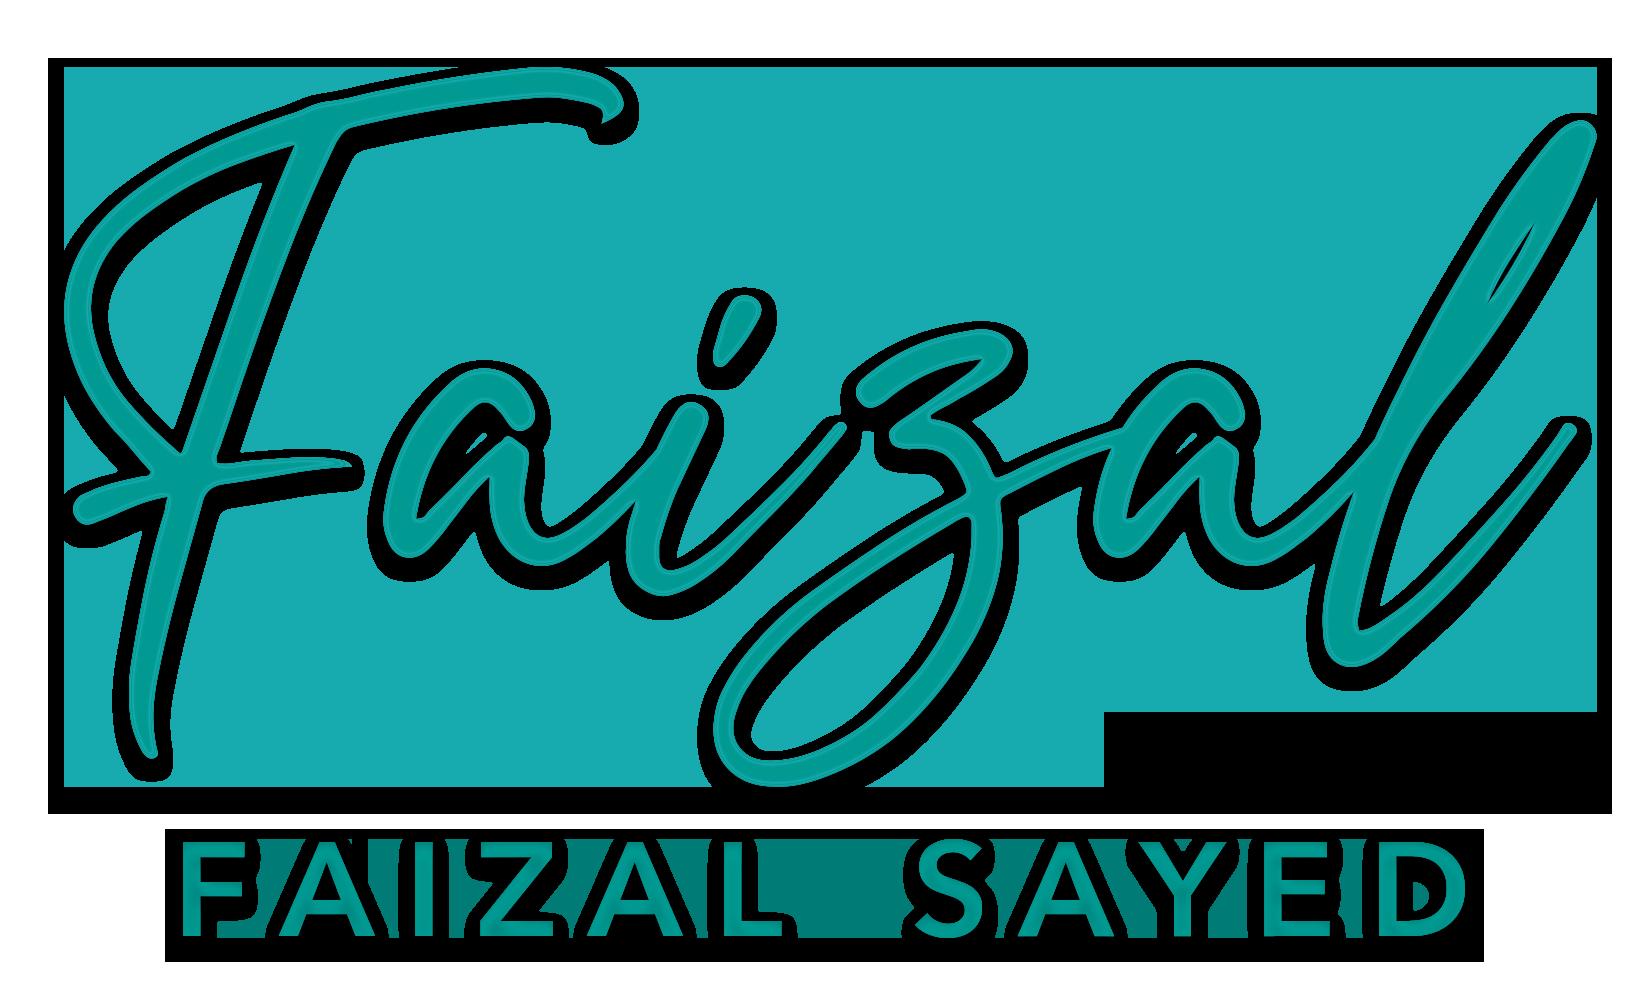 Faizal Sayed